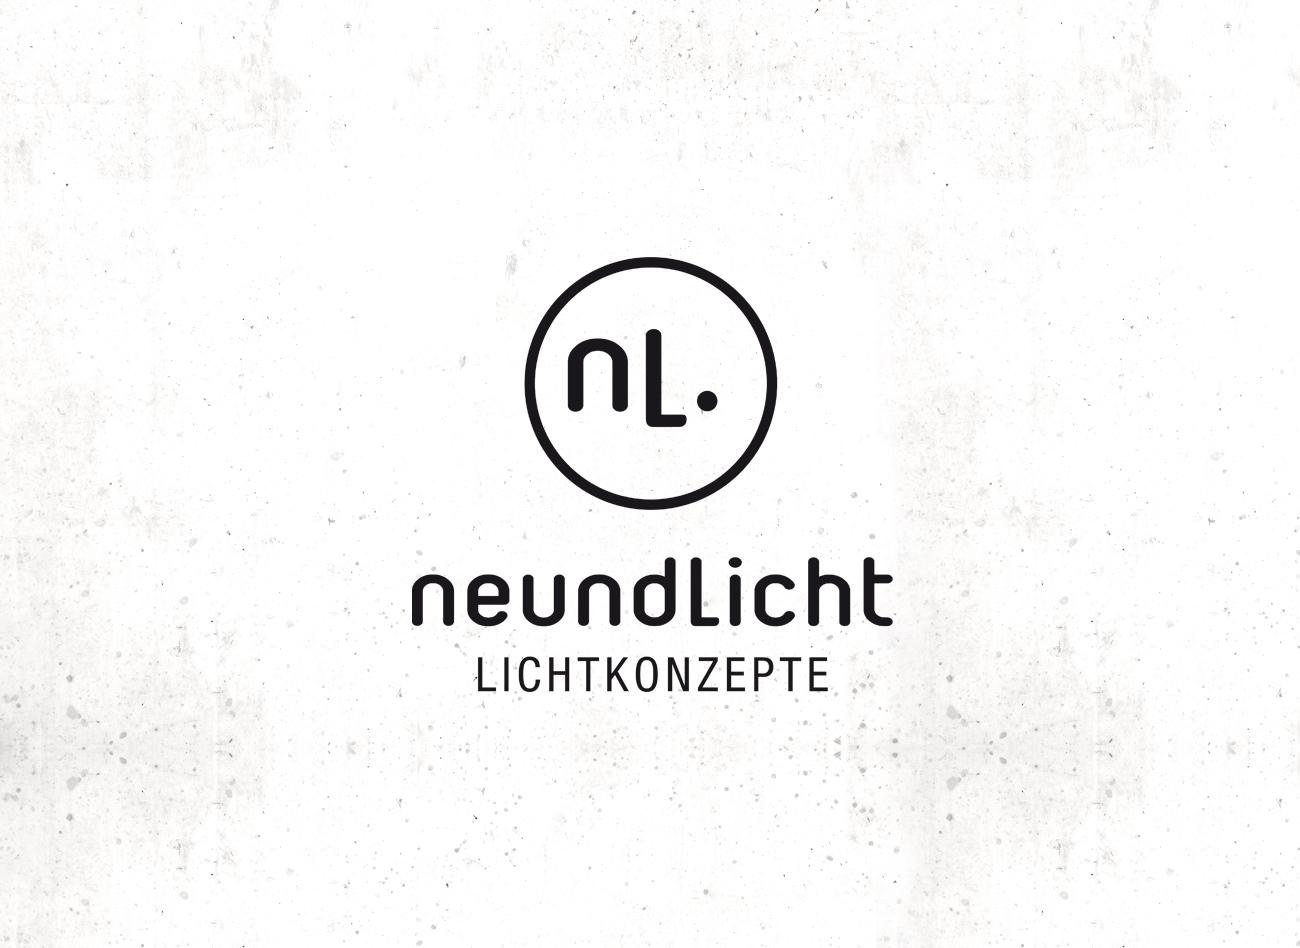 Logogestaltung / neundlicht